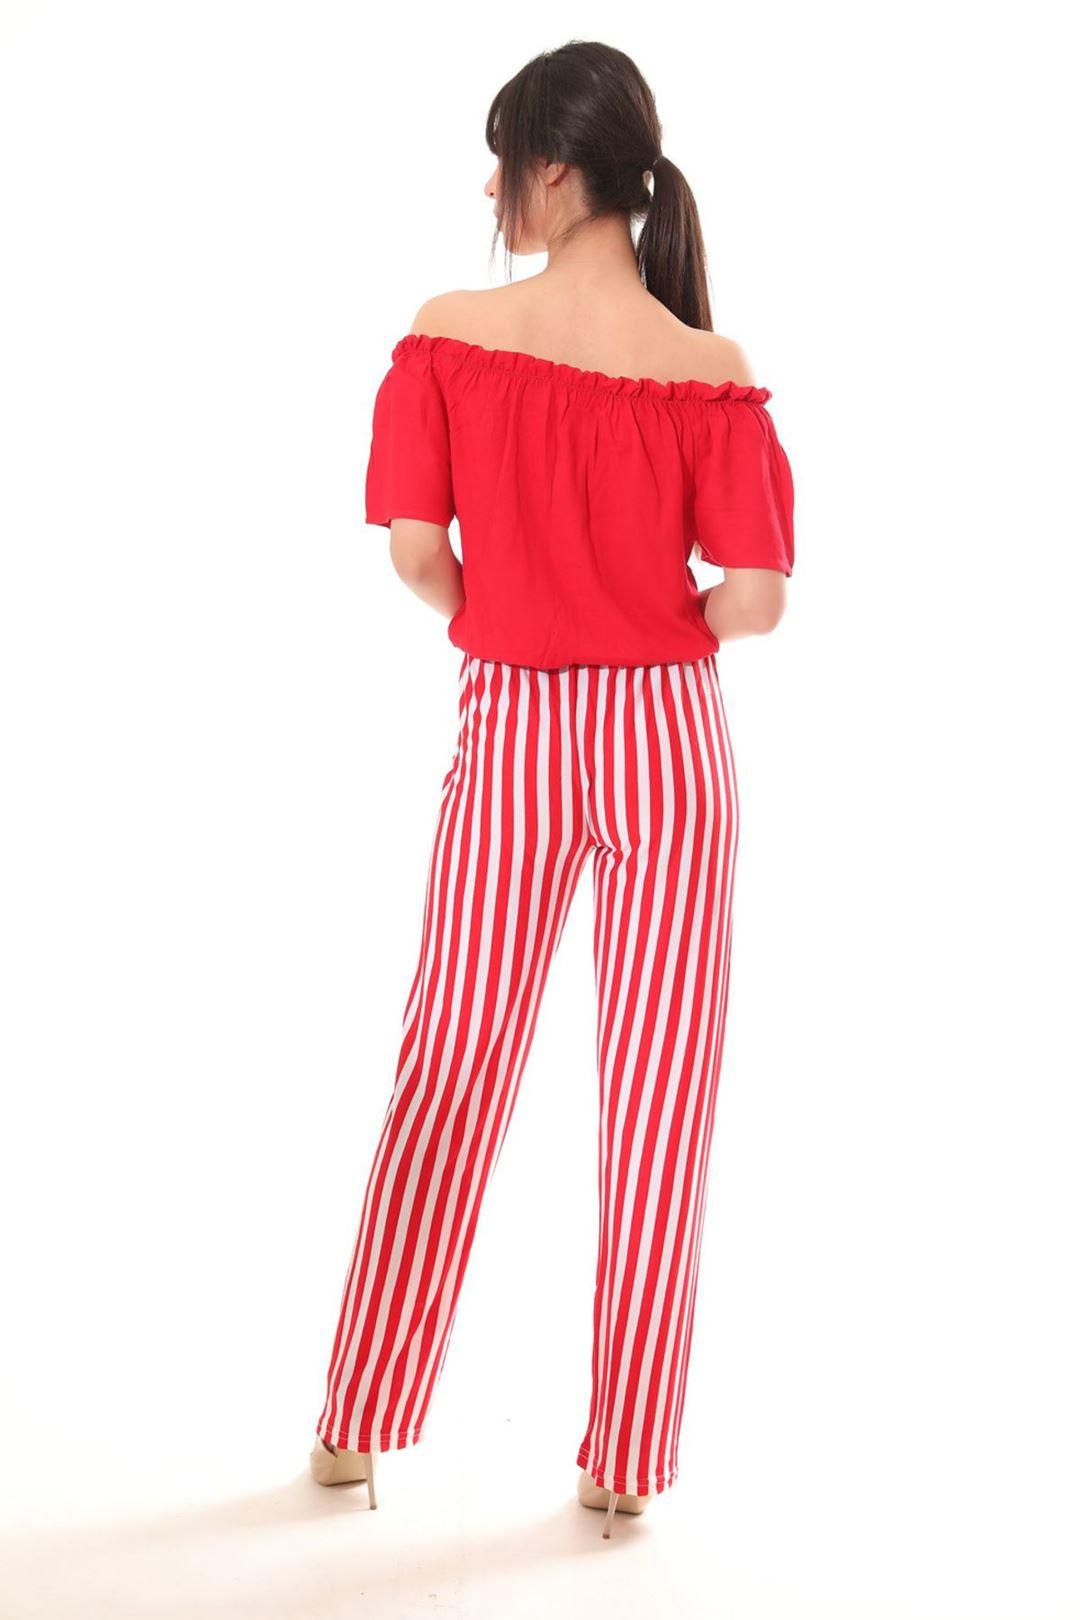 Salaş Pantolonlu İkili Takım Kırmızı